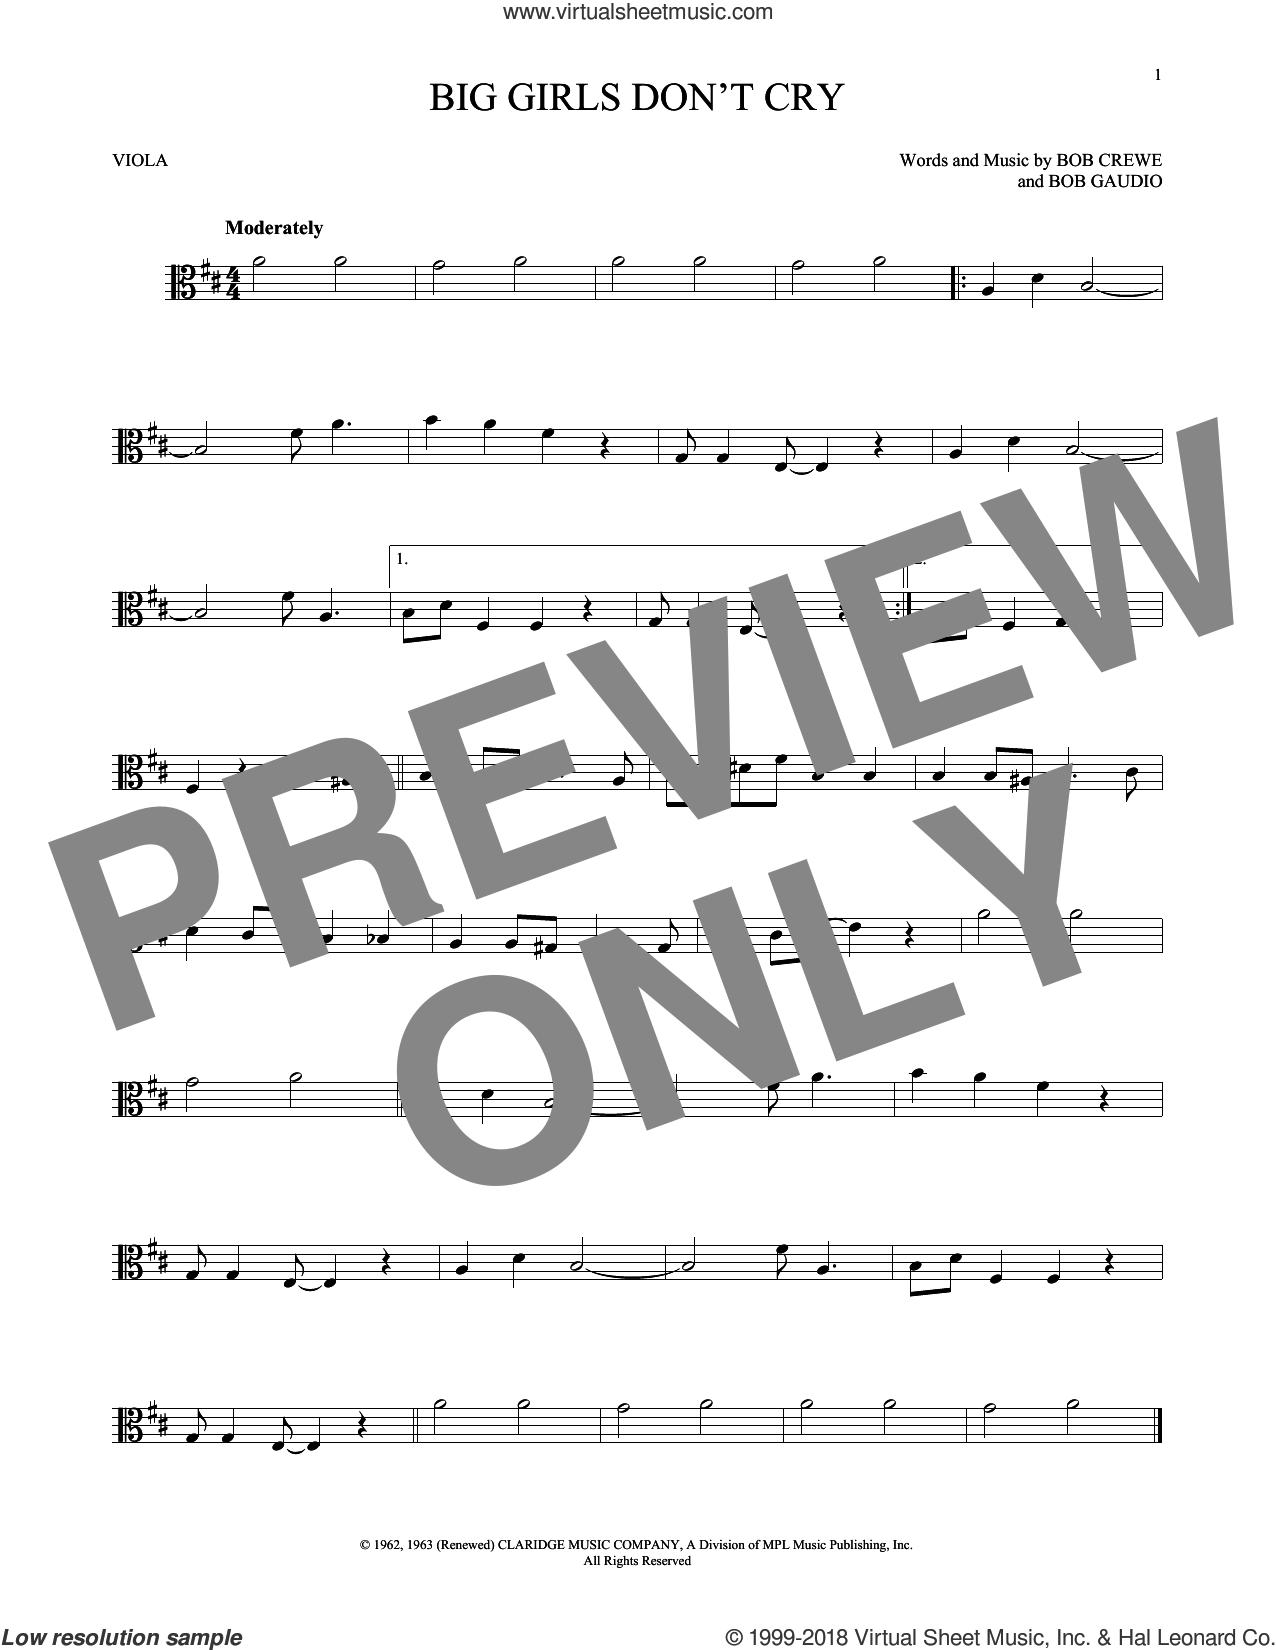 Big Girls Don't Cry sheet music for viola solo by The Four Seasons, Bob Crewe and Bob Gaudio, intermediate skill level